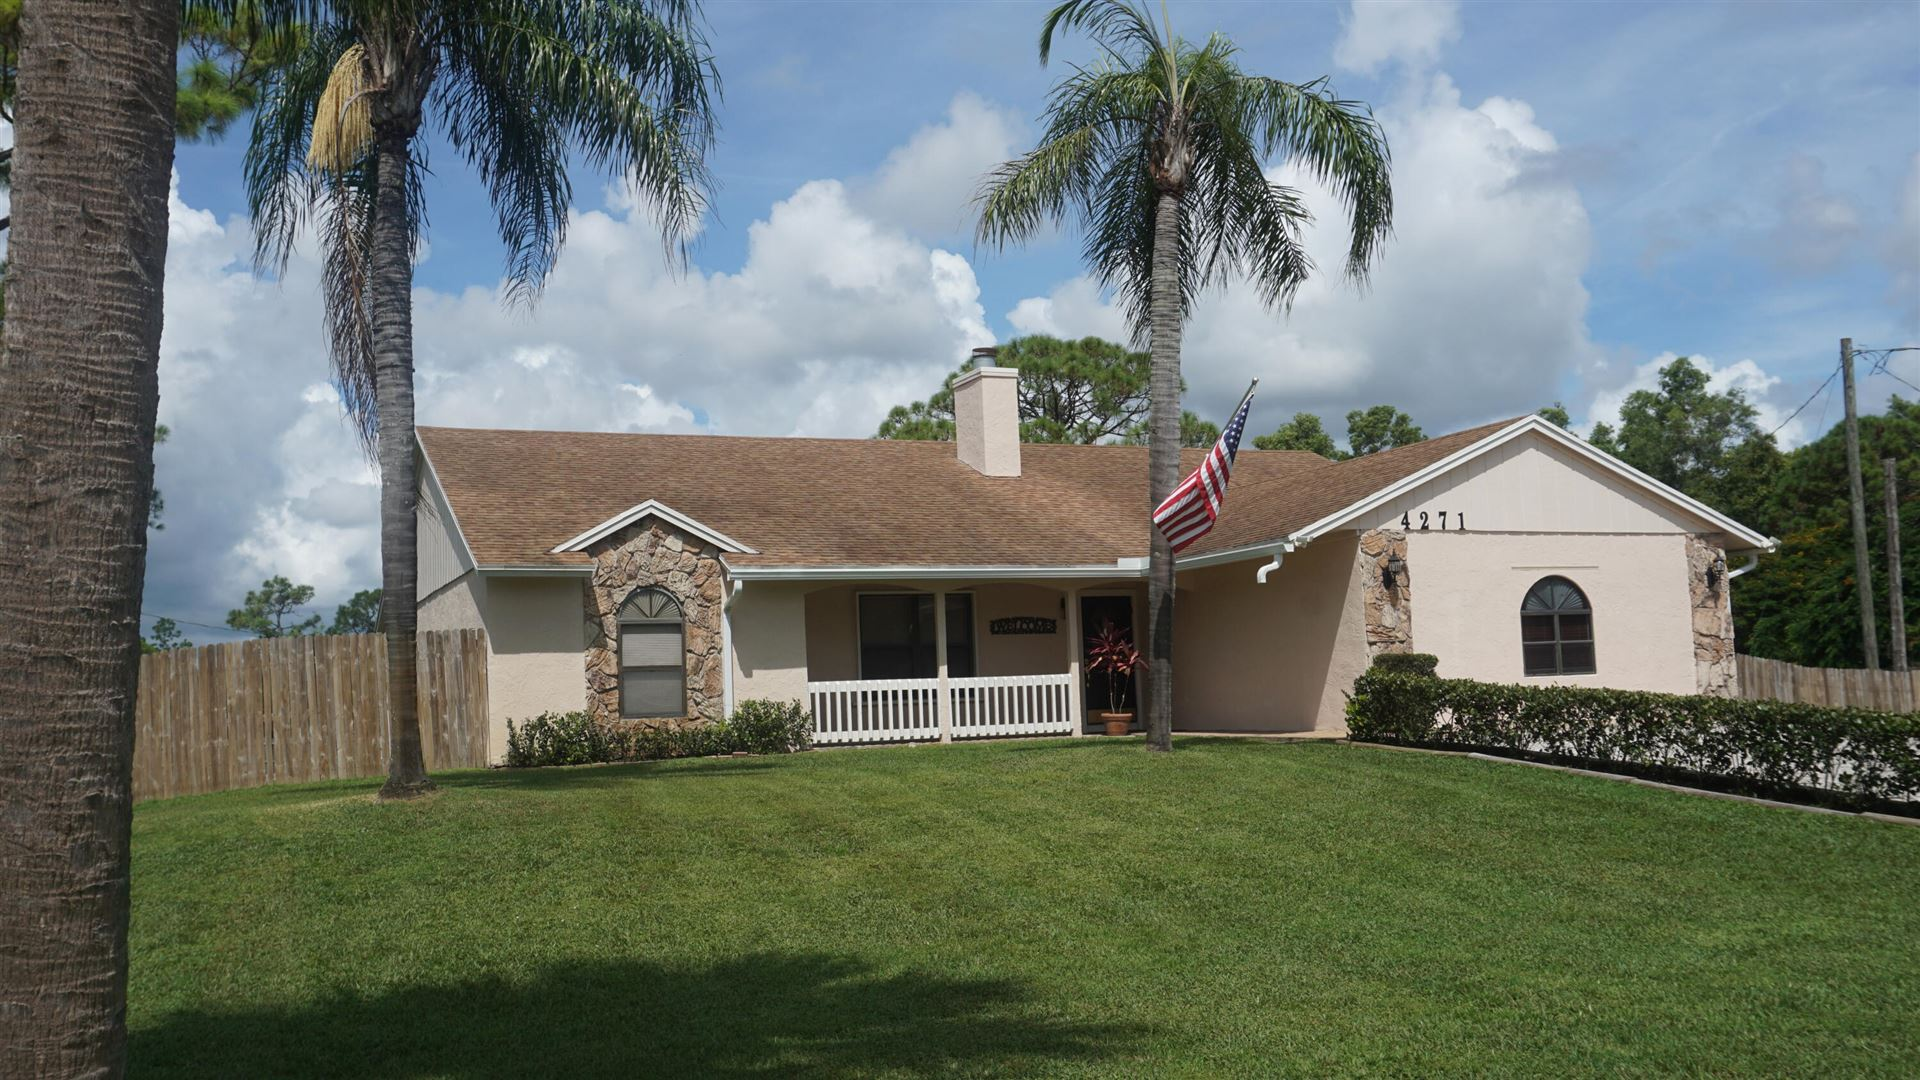 4271 Royal Palm Beach Boulevard, West Palm Beach, FL 33411 - MLS#: RX-10742880